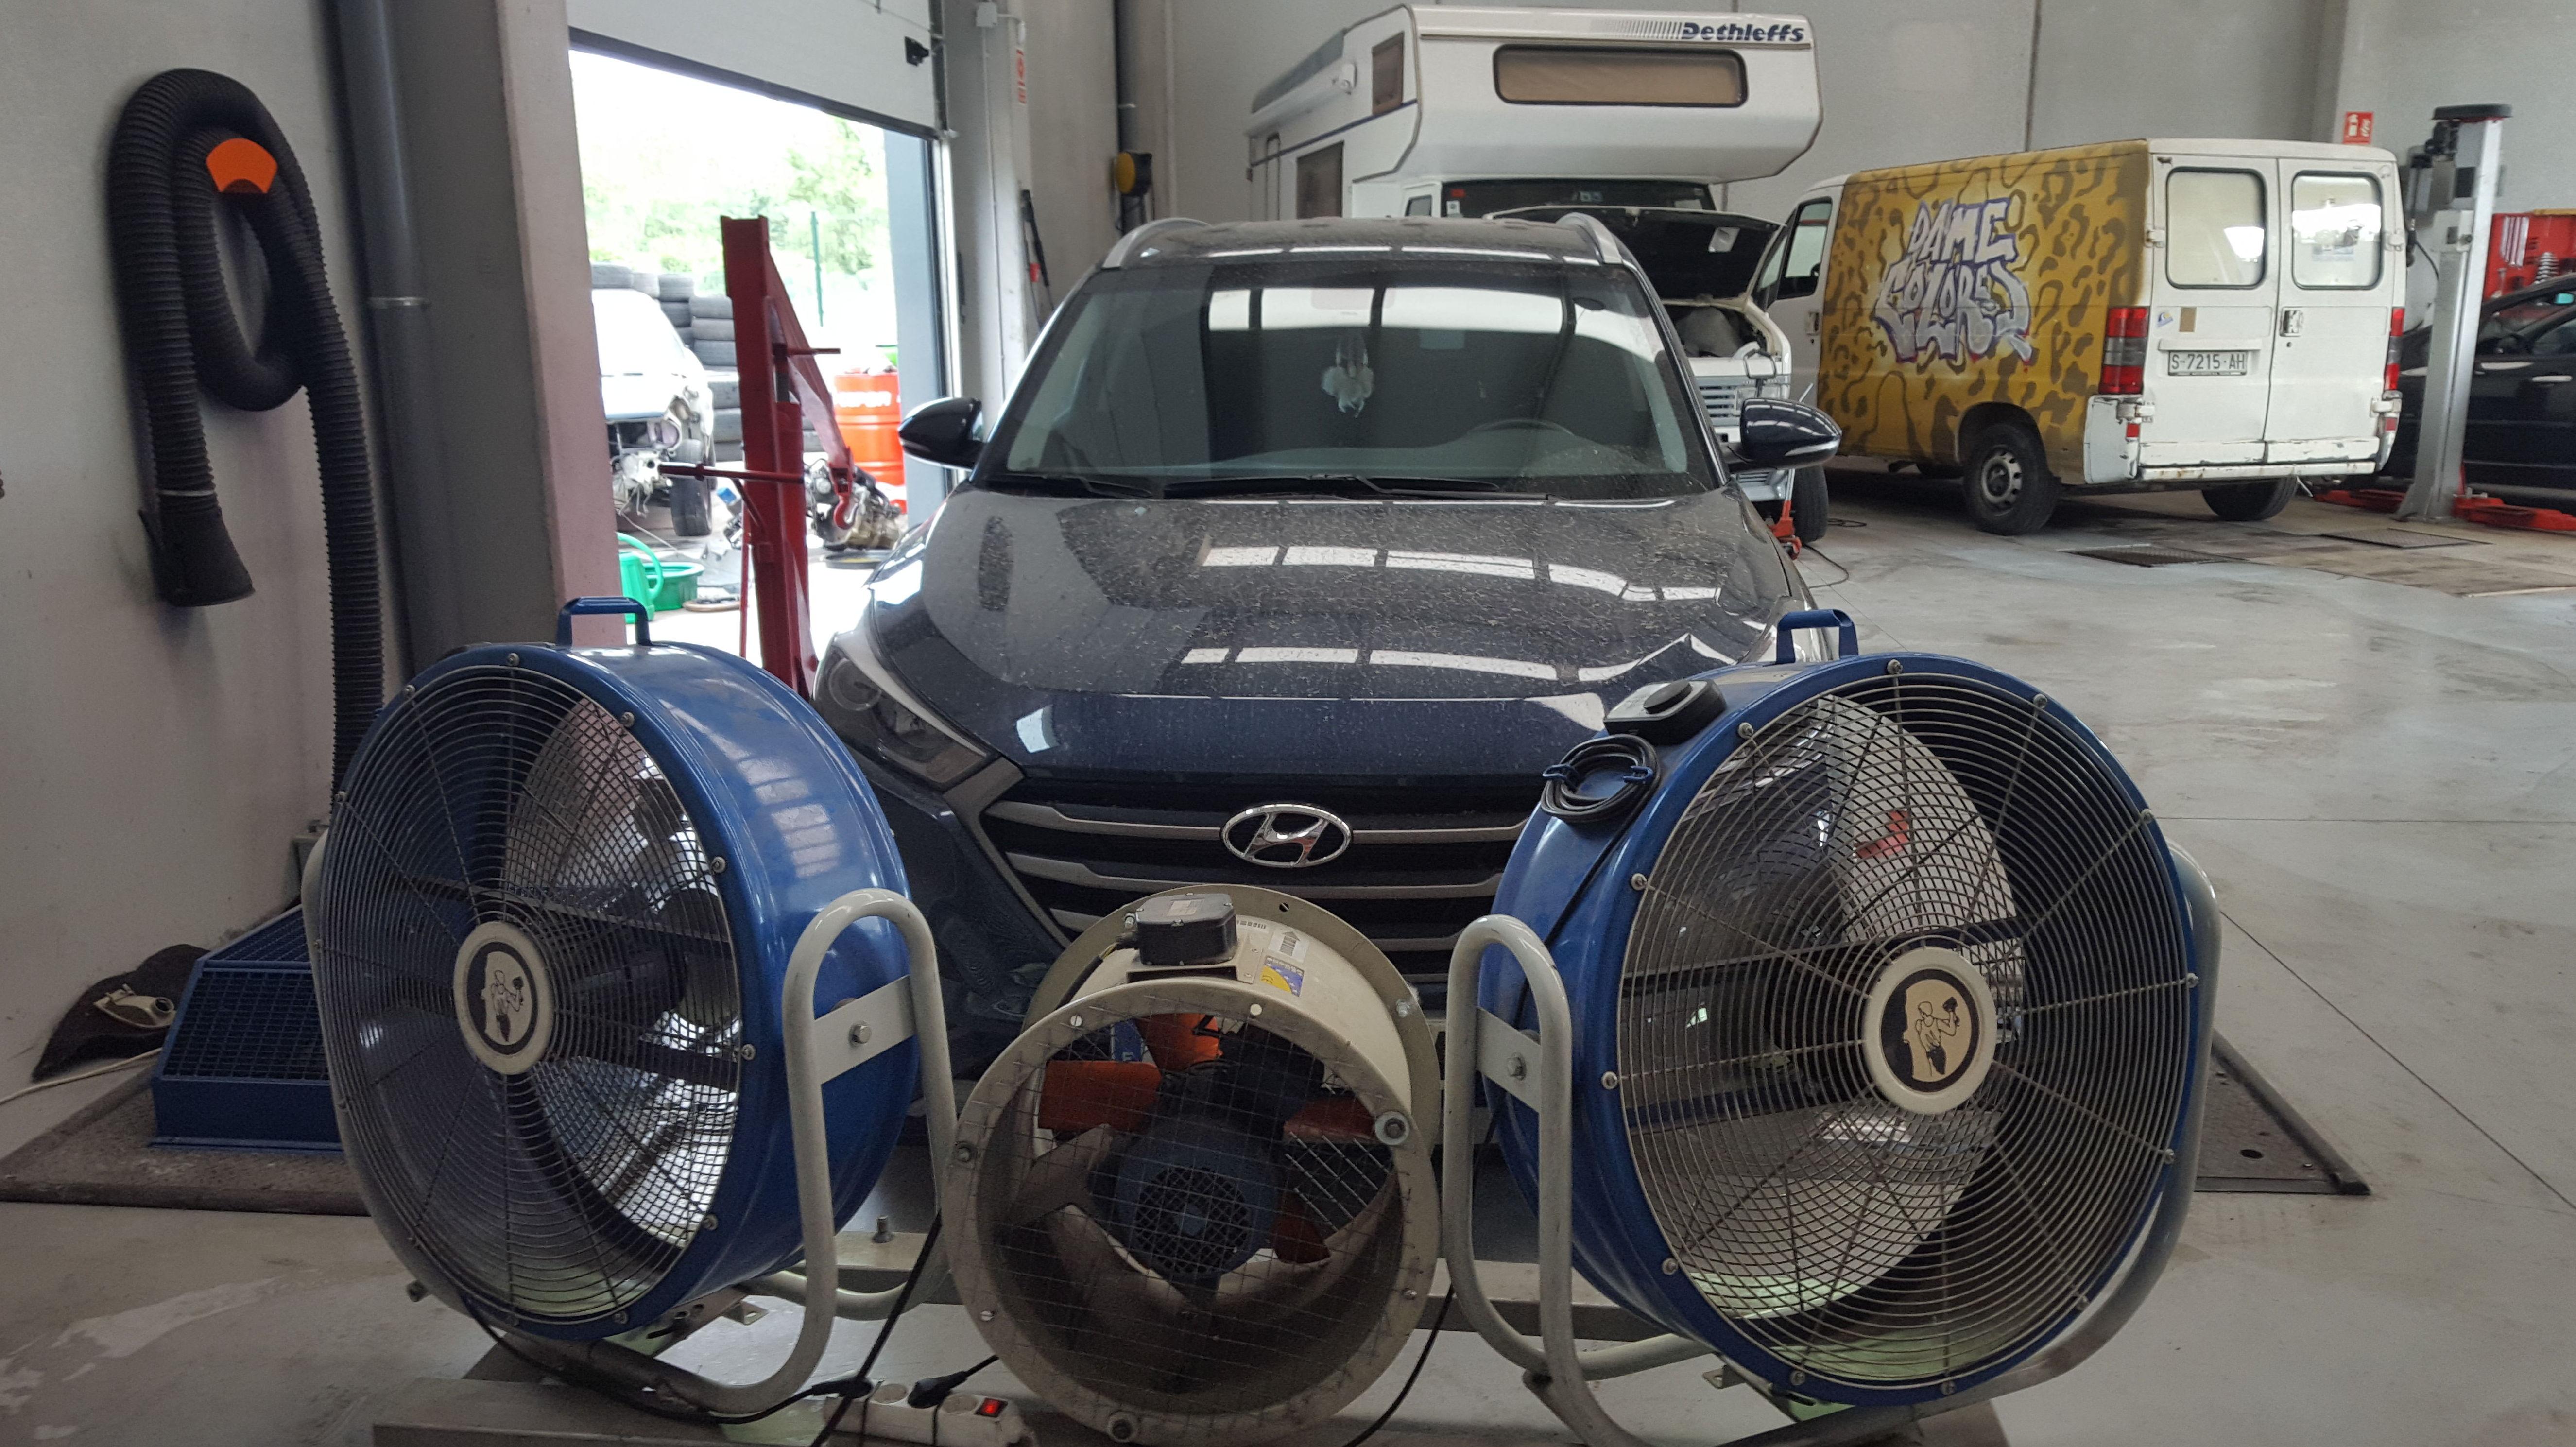 Foto 3 de Talleres de automóviles en La Cellera de Ter | Taller Mecànic Moreevolution